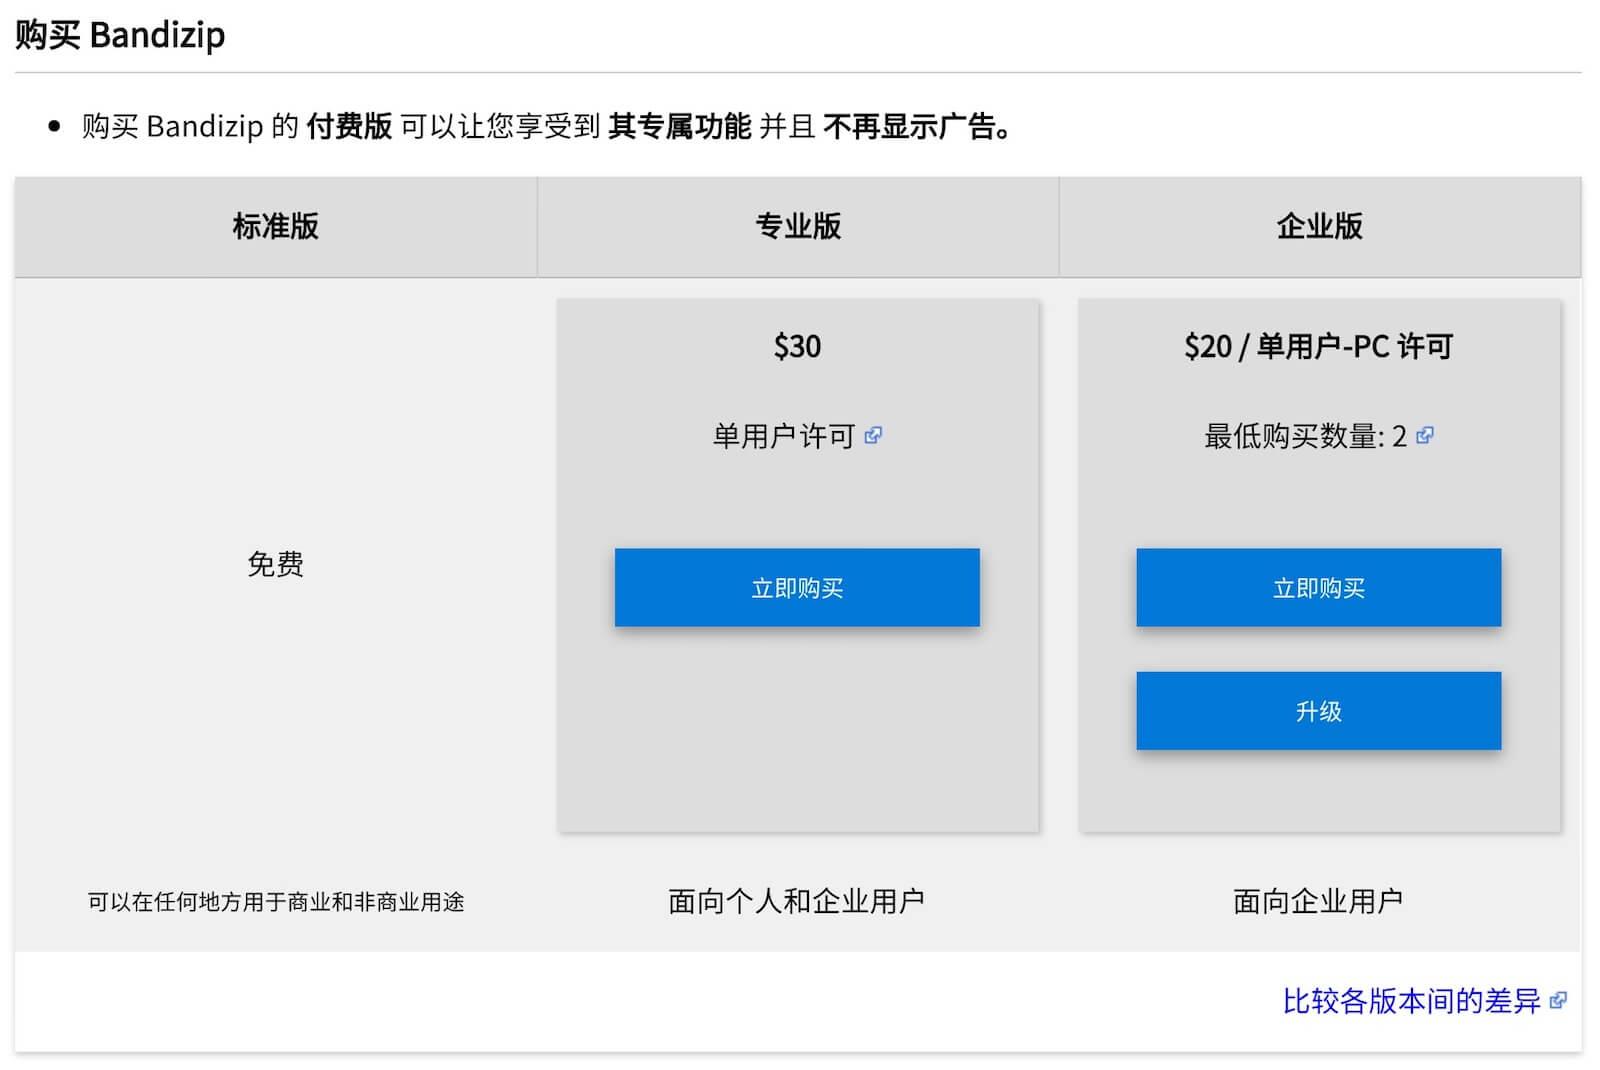 Bandizip 7.0将采取收费去广告模式 专业版30美元